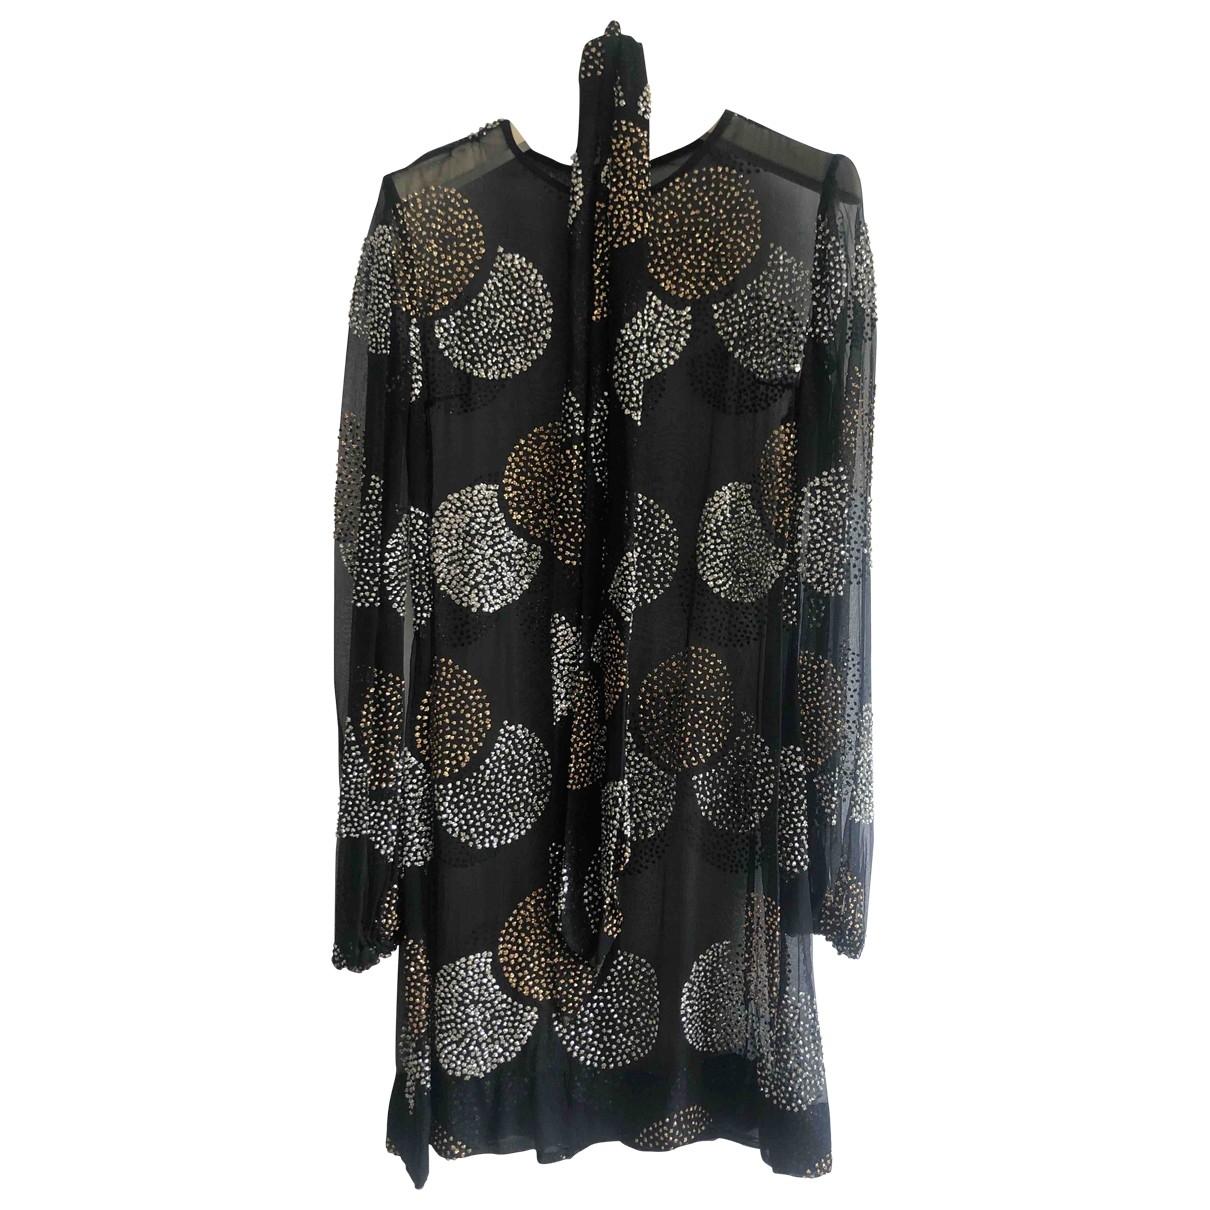 Sonia Rykiel \N Black Glitter dress for Women 38 FR